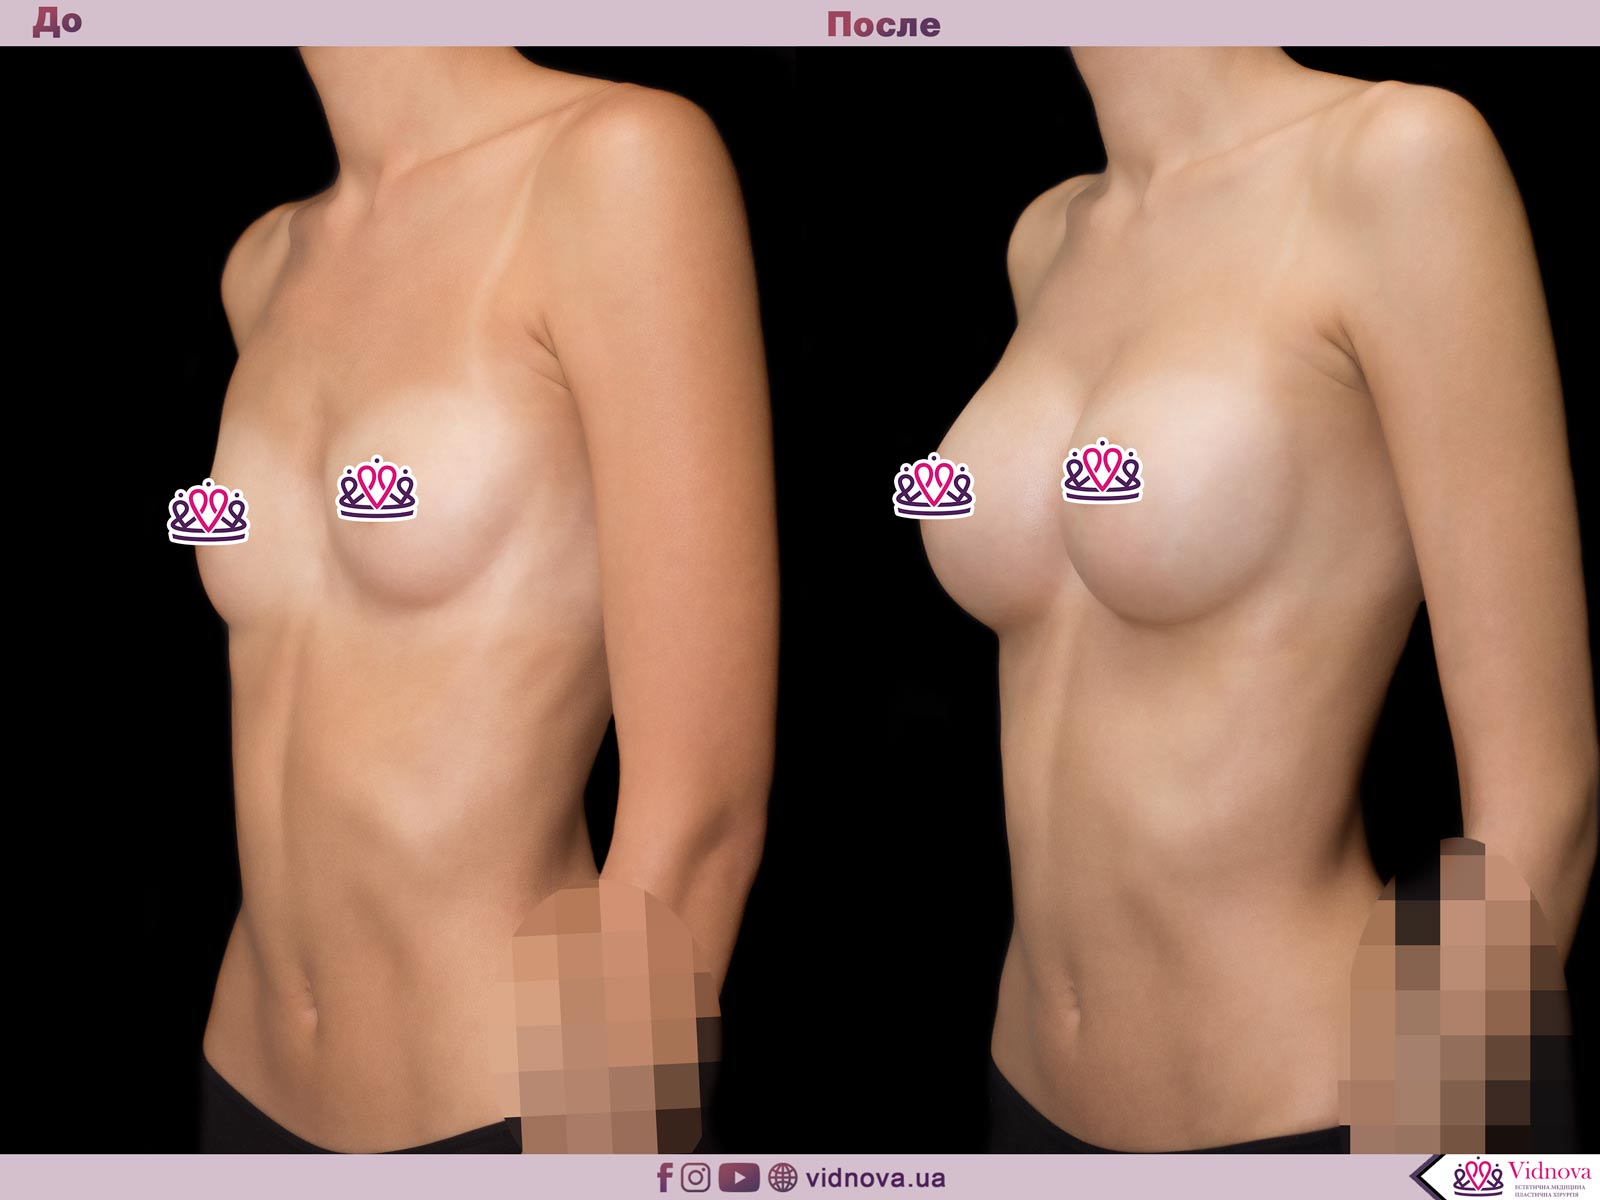 Увеличение груди: Фото ДО и ПОСЛЕ - Пример №44-2 - Клиника Vidnova